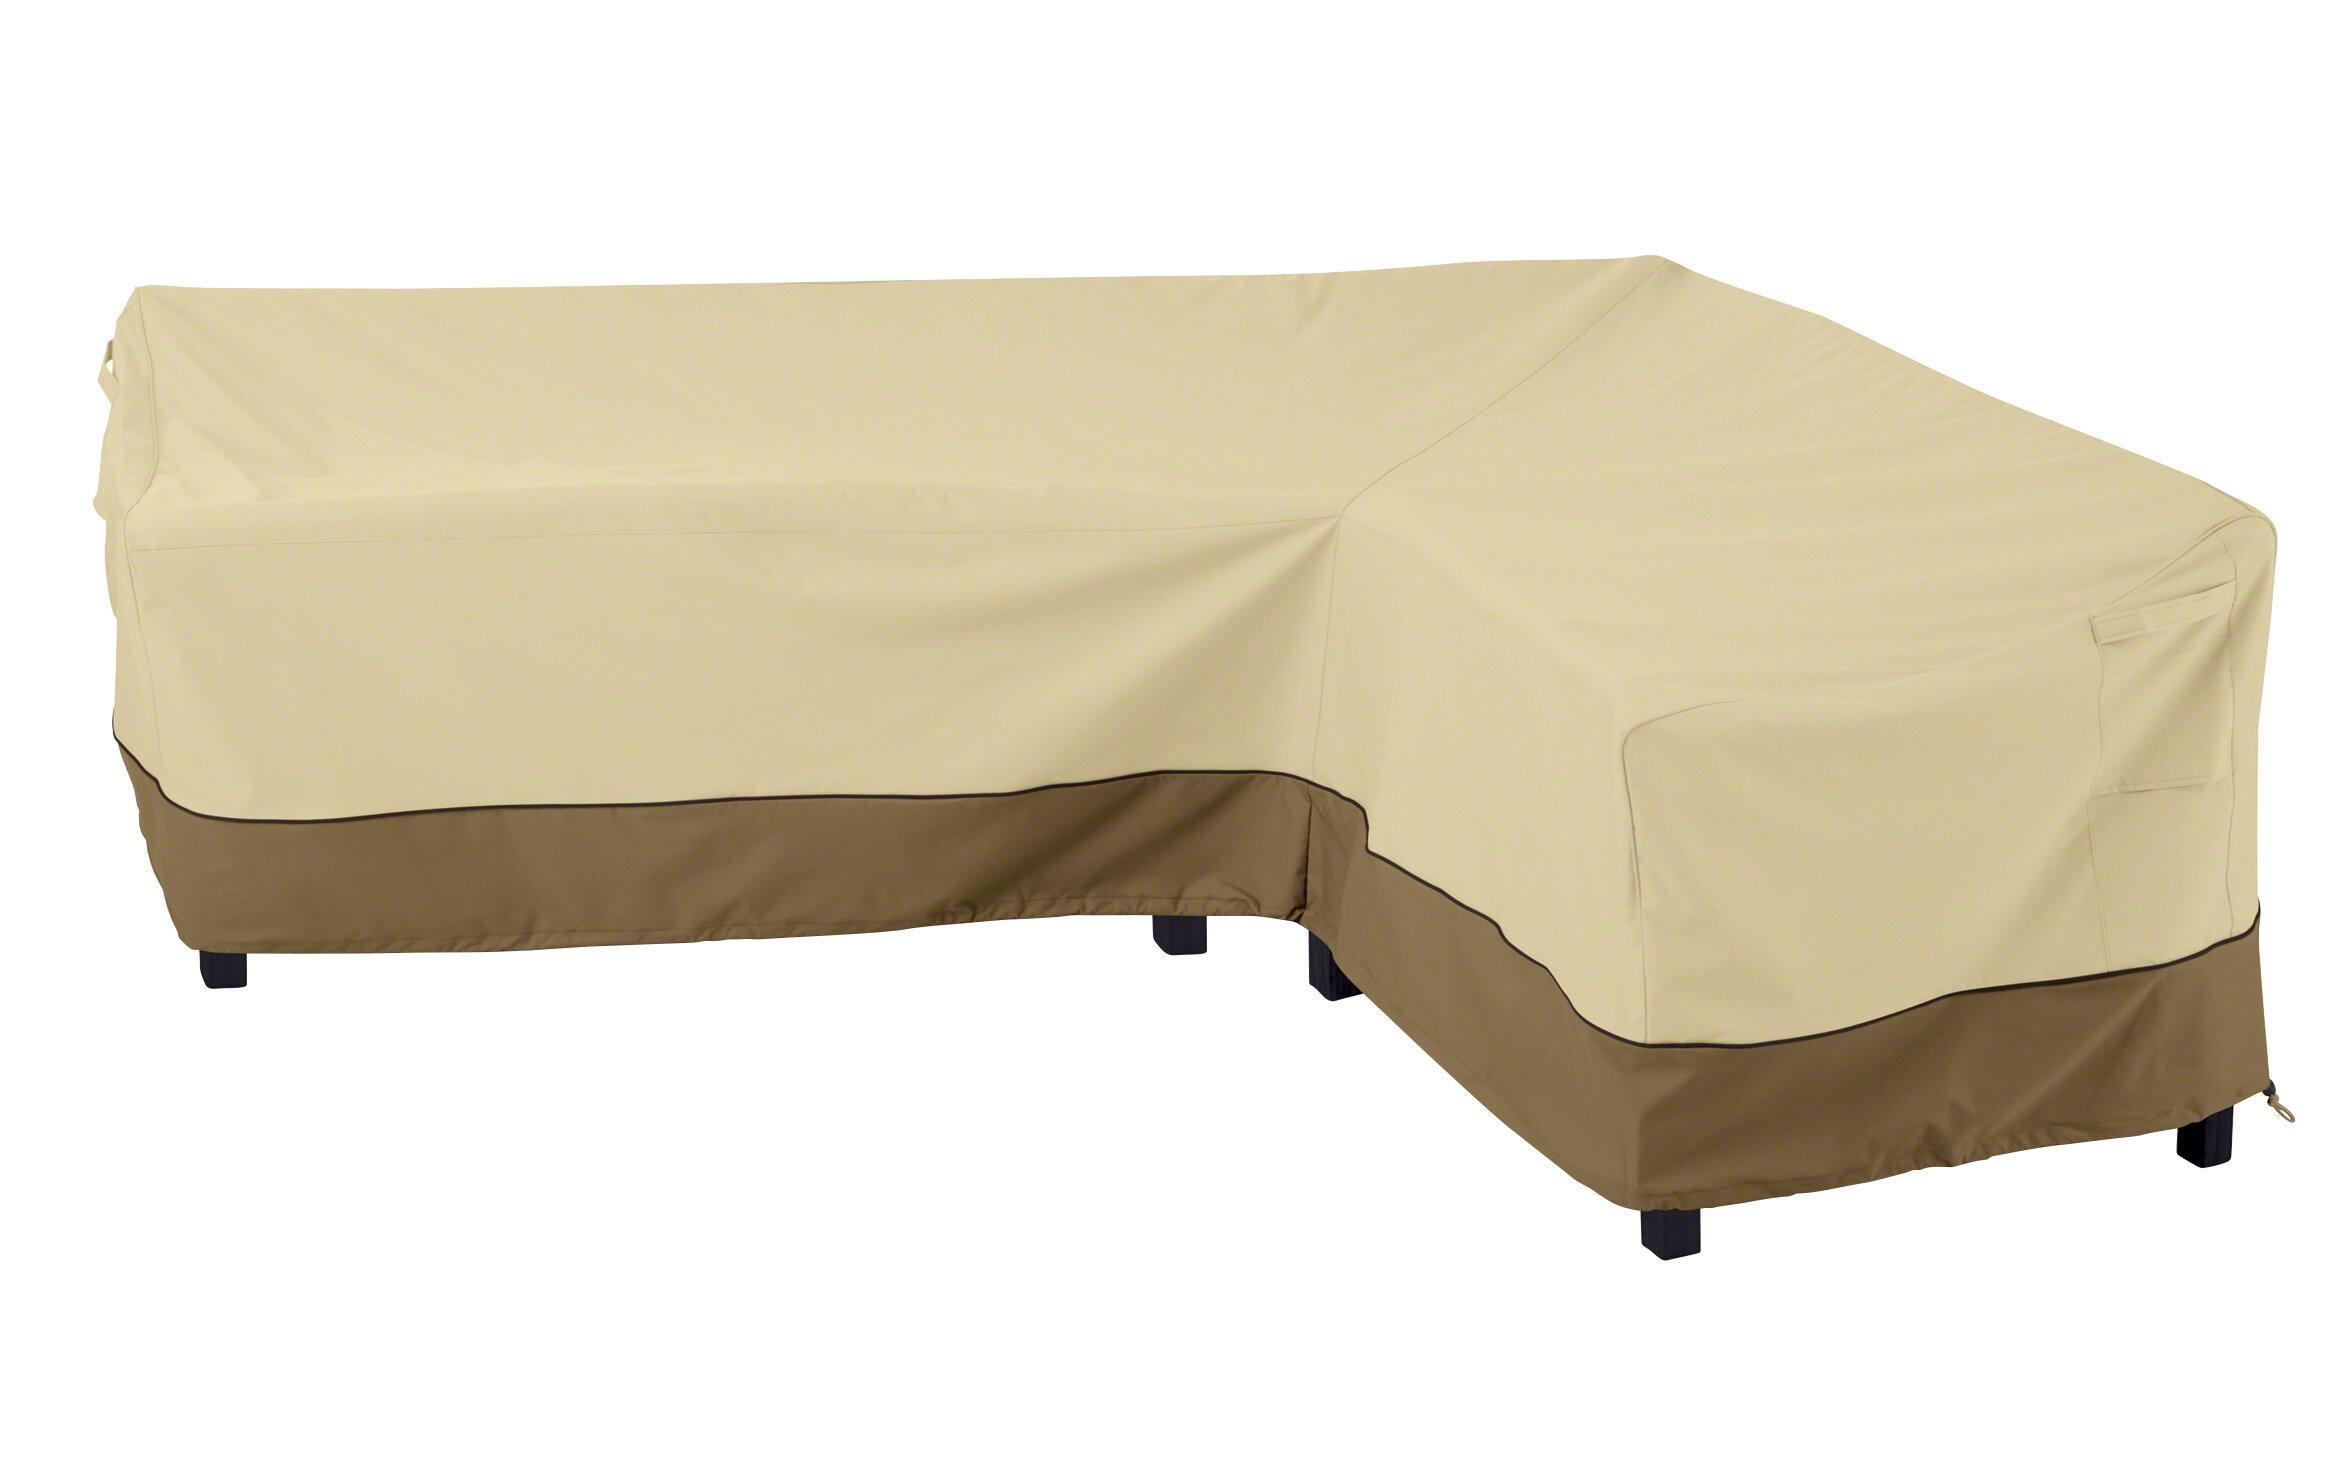 Red Barrel Studio Water Resistant Patio Sofa Cover   Wayfair